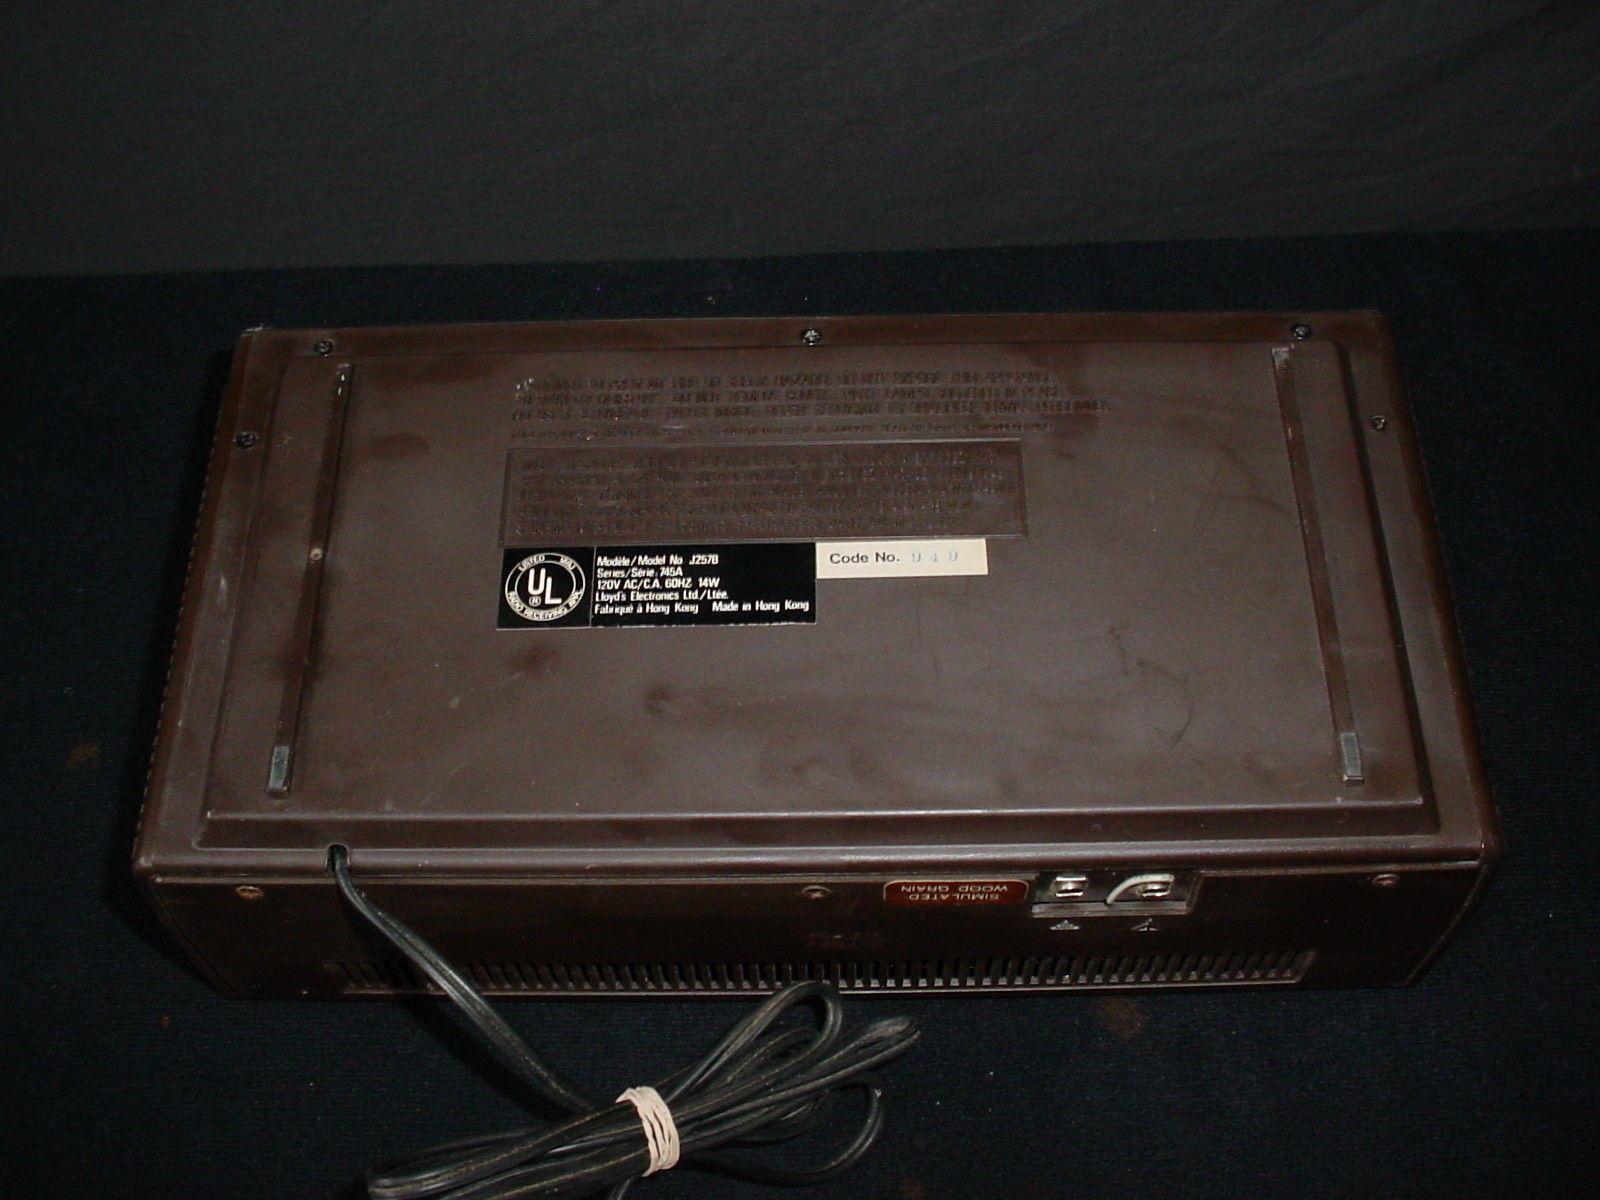 vintage lloyds am fm digital clock radio alarm retro j257b digital clocks. Black Bedroom Furniture Sets. Home Design Ideas